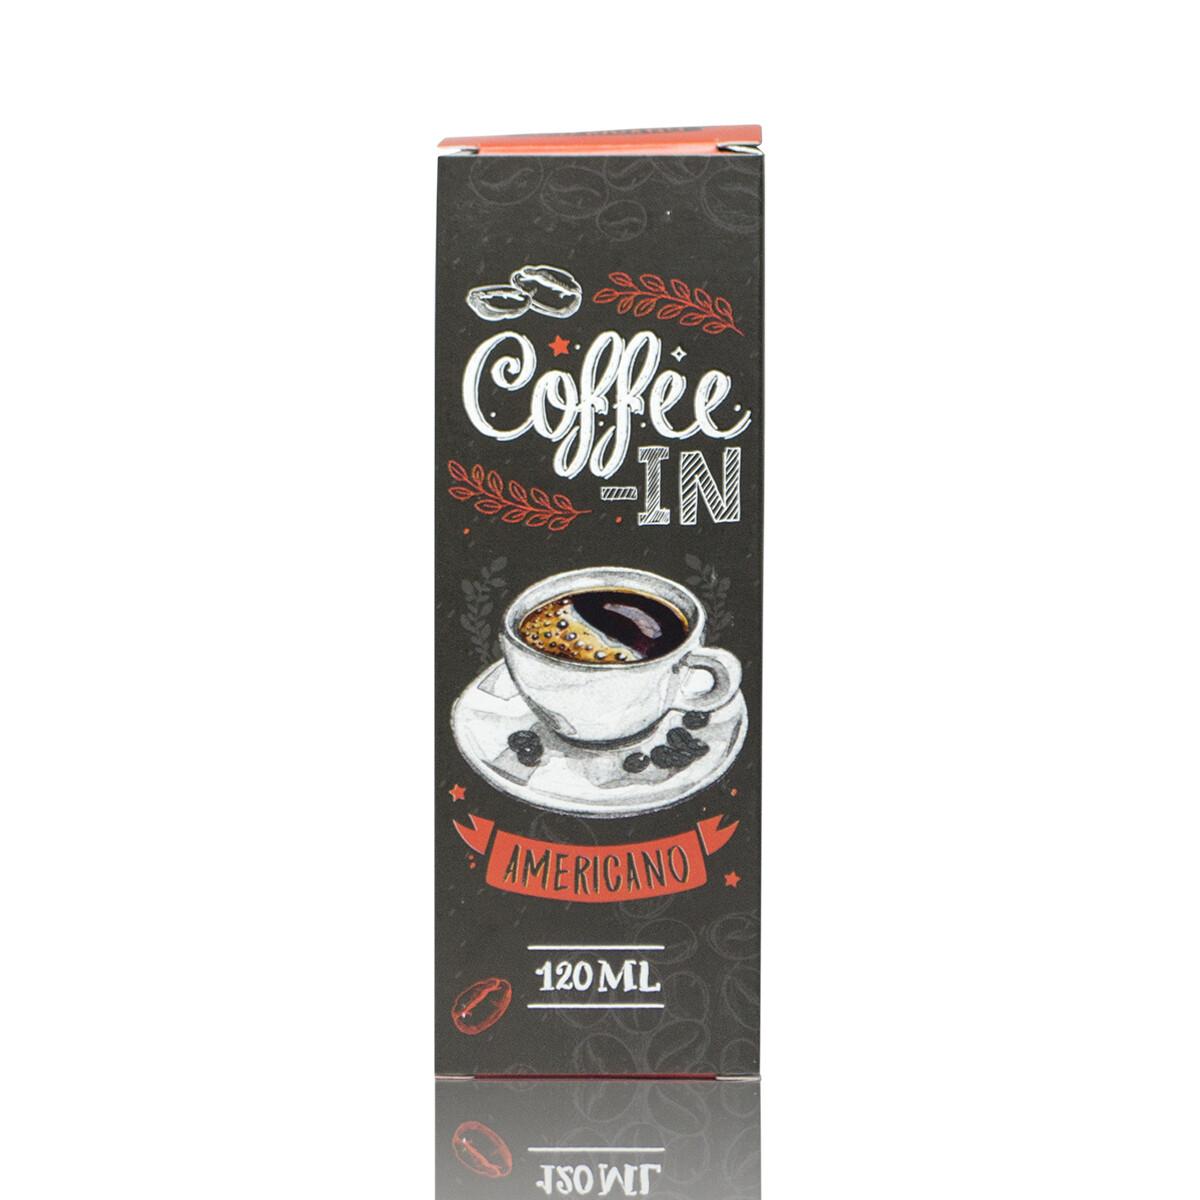 COFFE-IN: AMERICANO 120ML 3MG